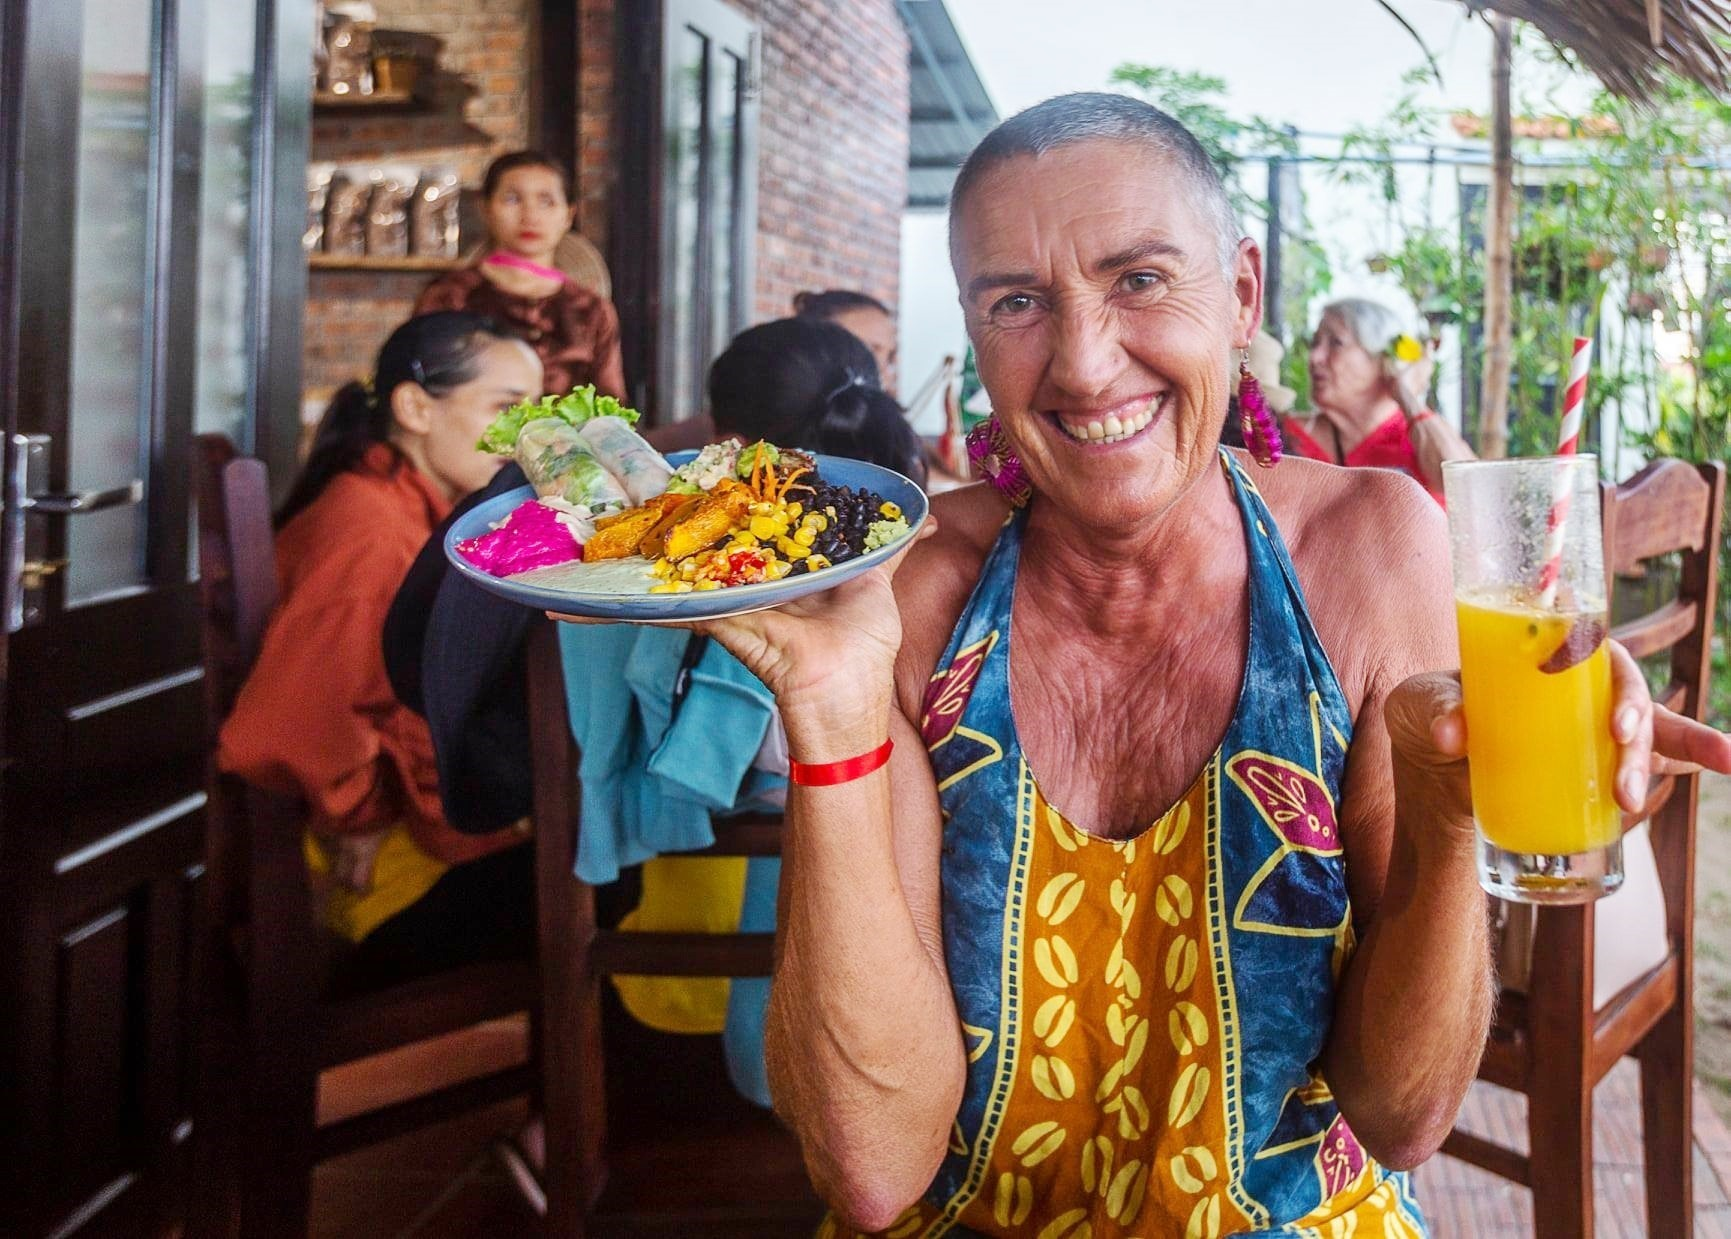 Foreign tourists enjoy vegetarian food at Veggie Hut restaurant